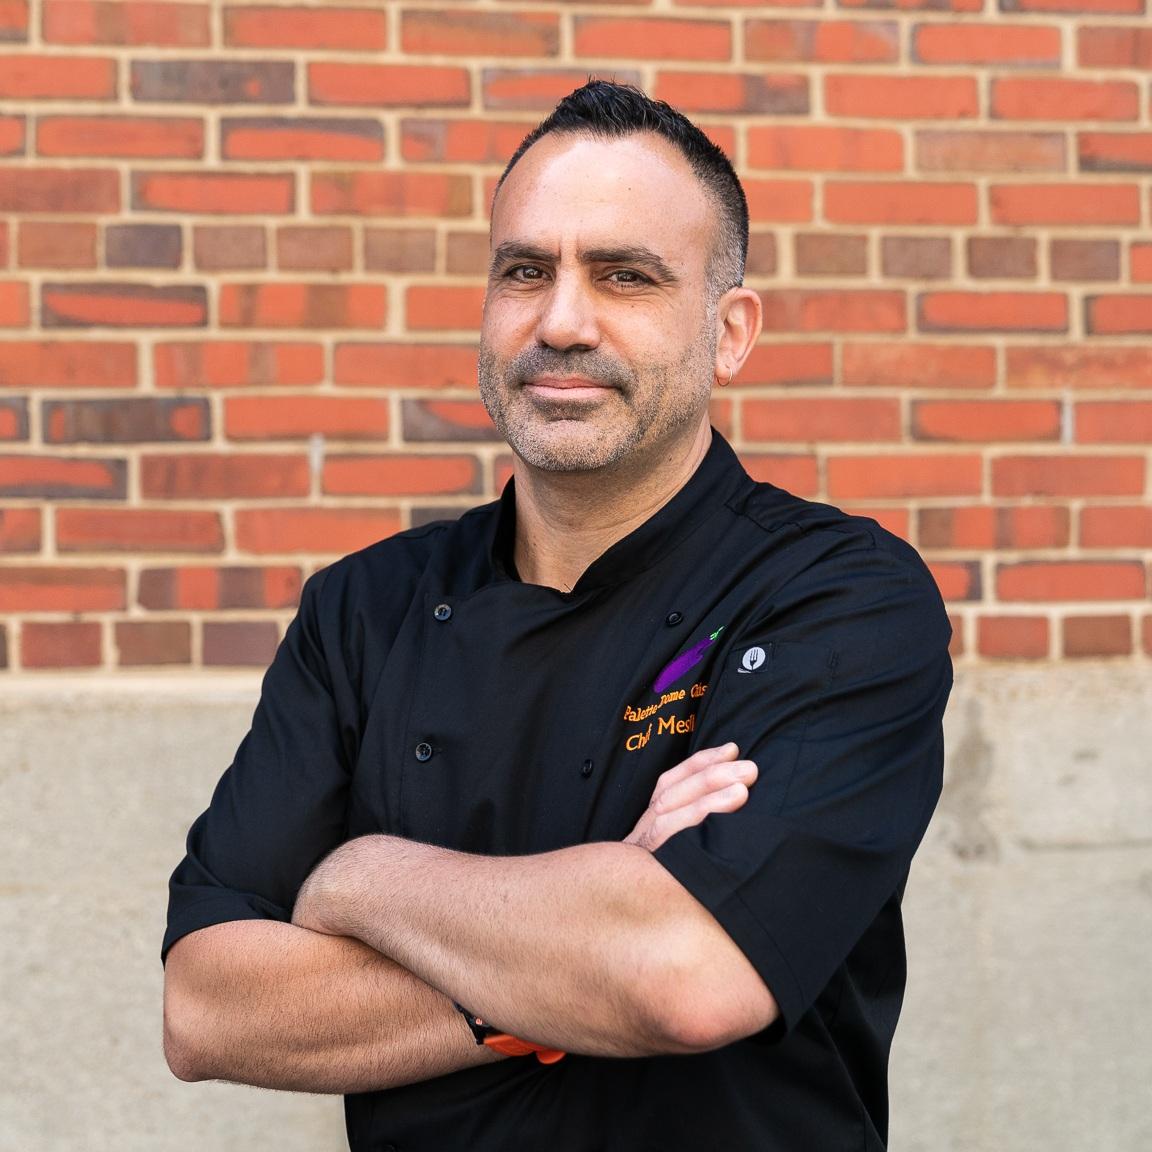 Chef Hagai Mesilati